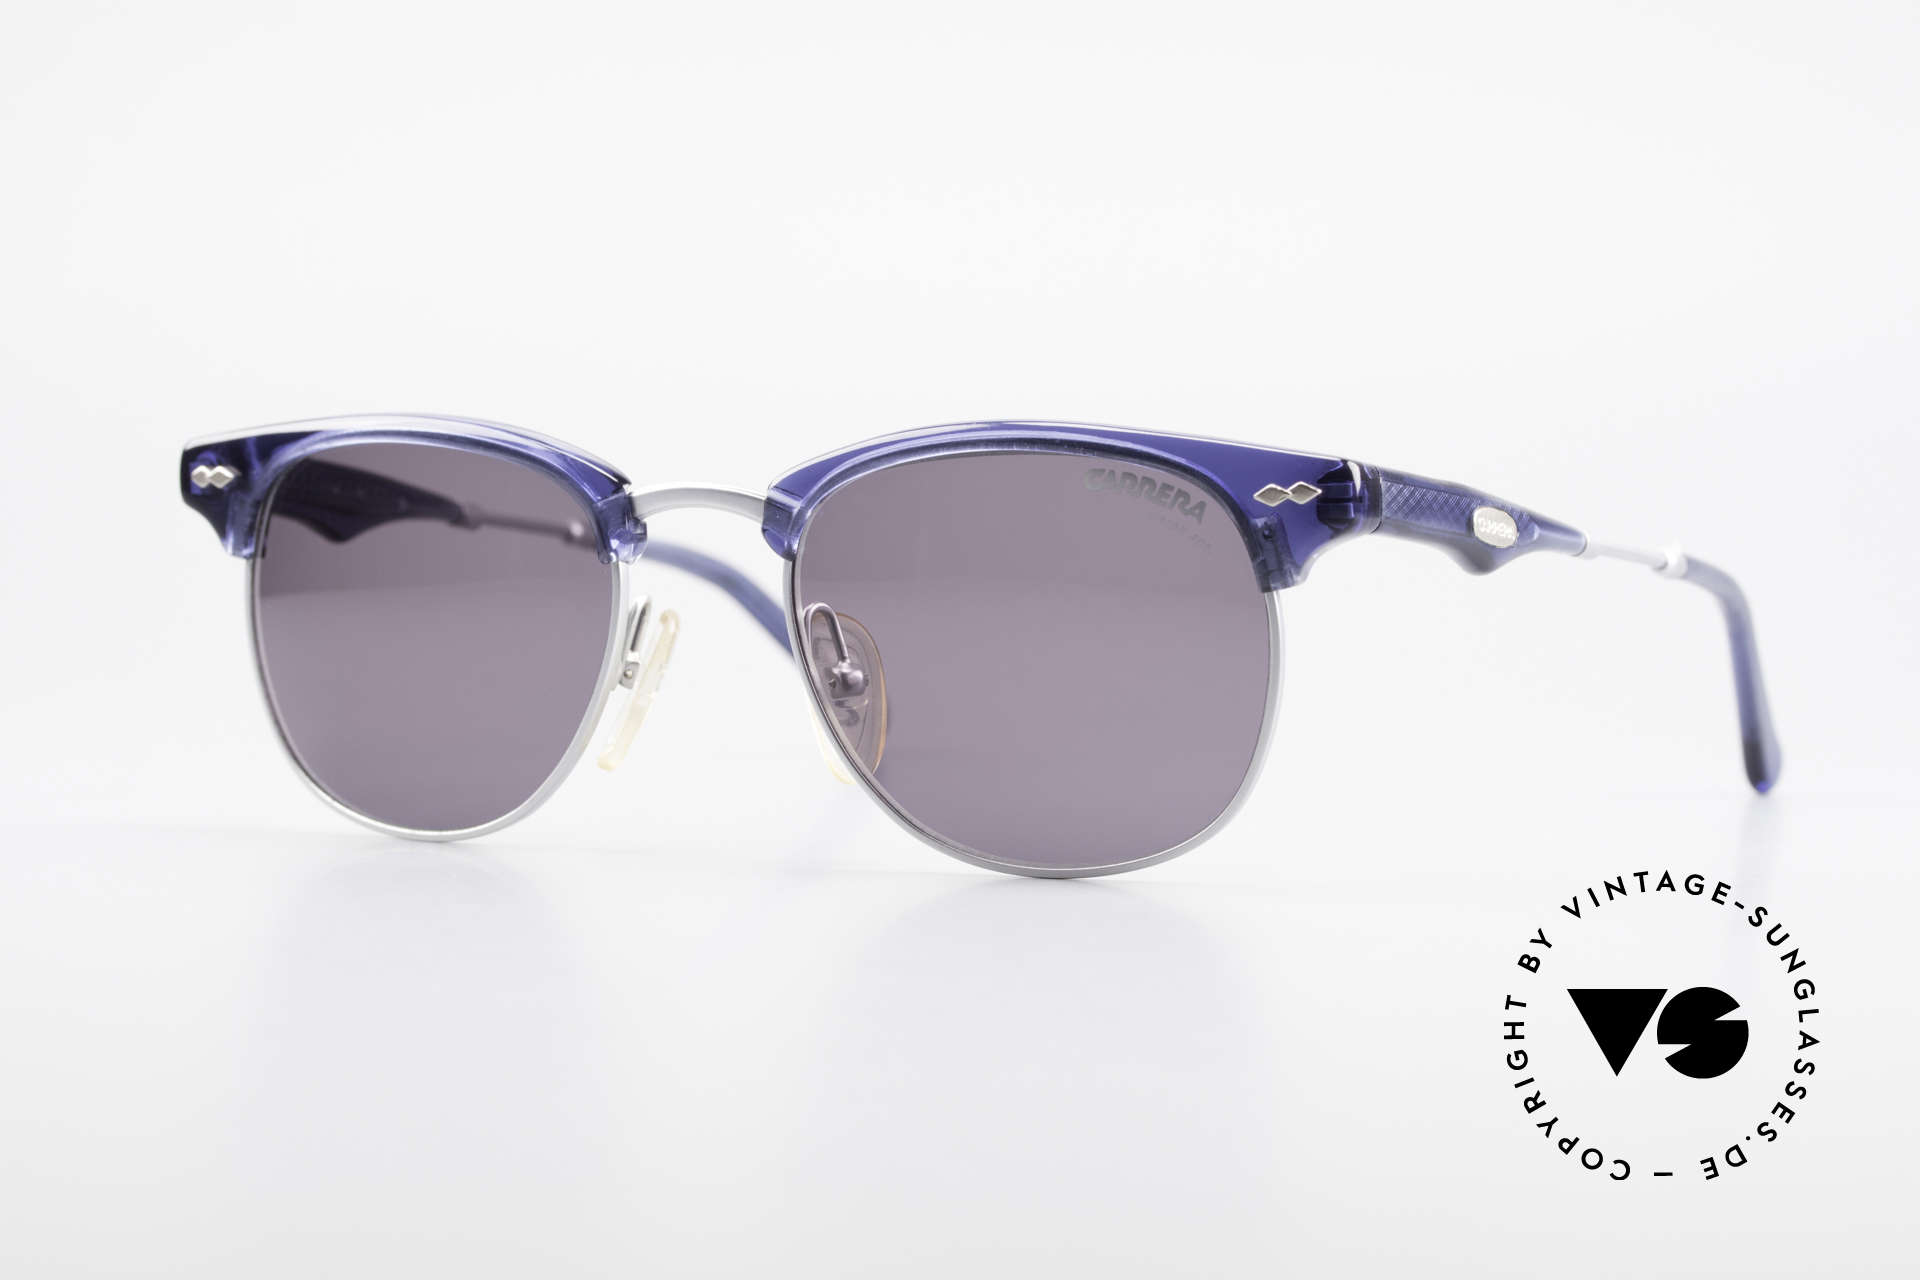 Carrera 5324 Vintage Panto Sunglasses 90s, very stylish Carrera vintage 'gentleman sunglasses', Made for Men